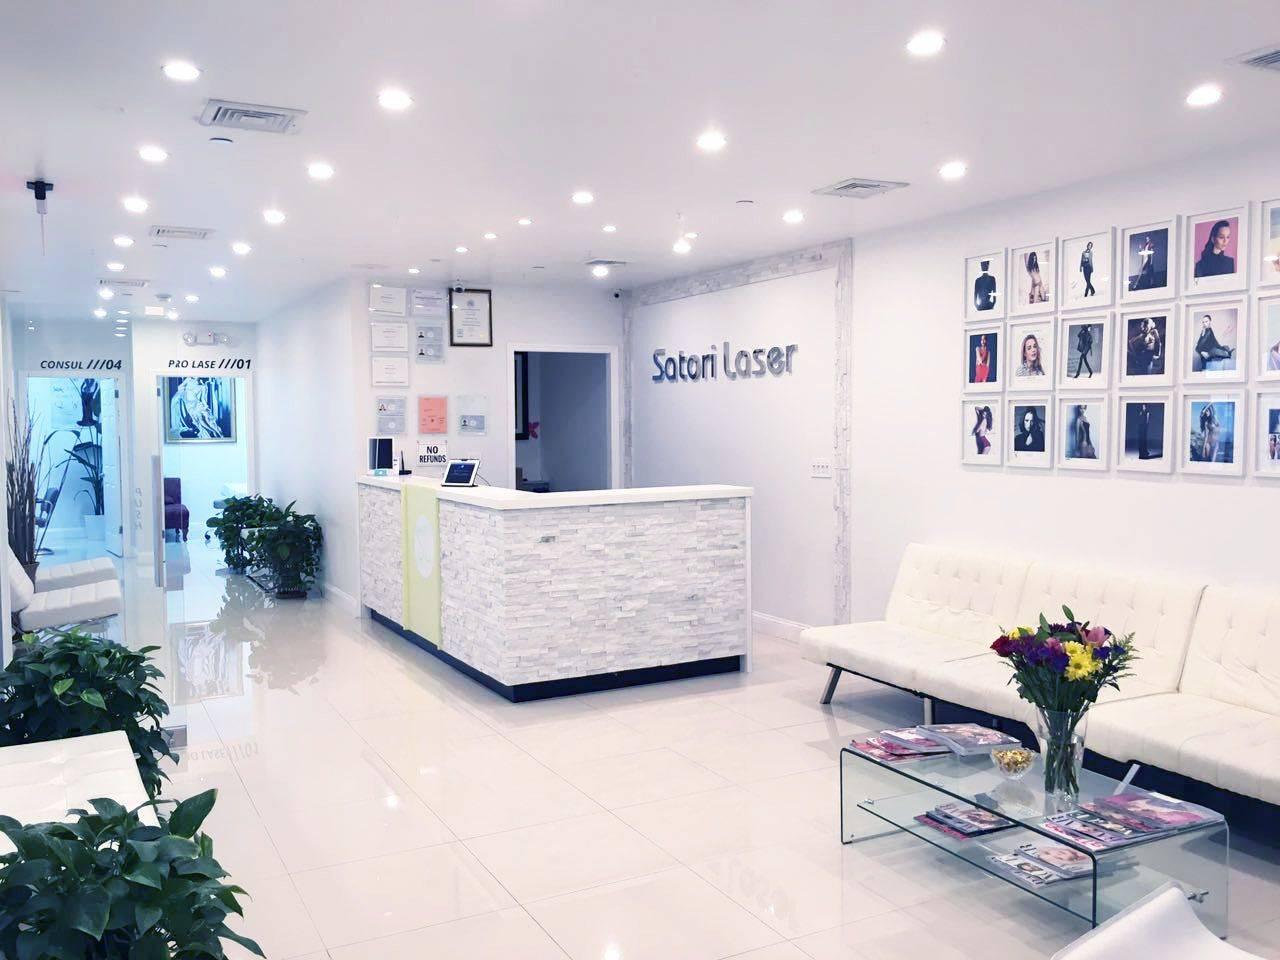 Satori Laser Hair Removal 34th St